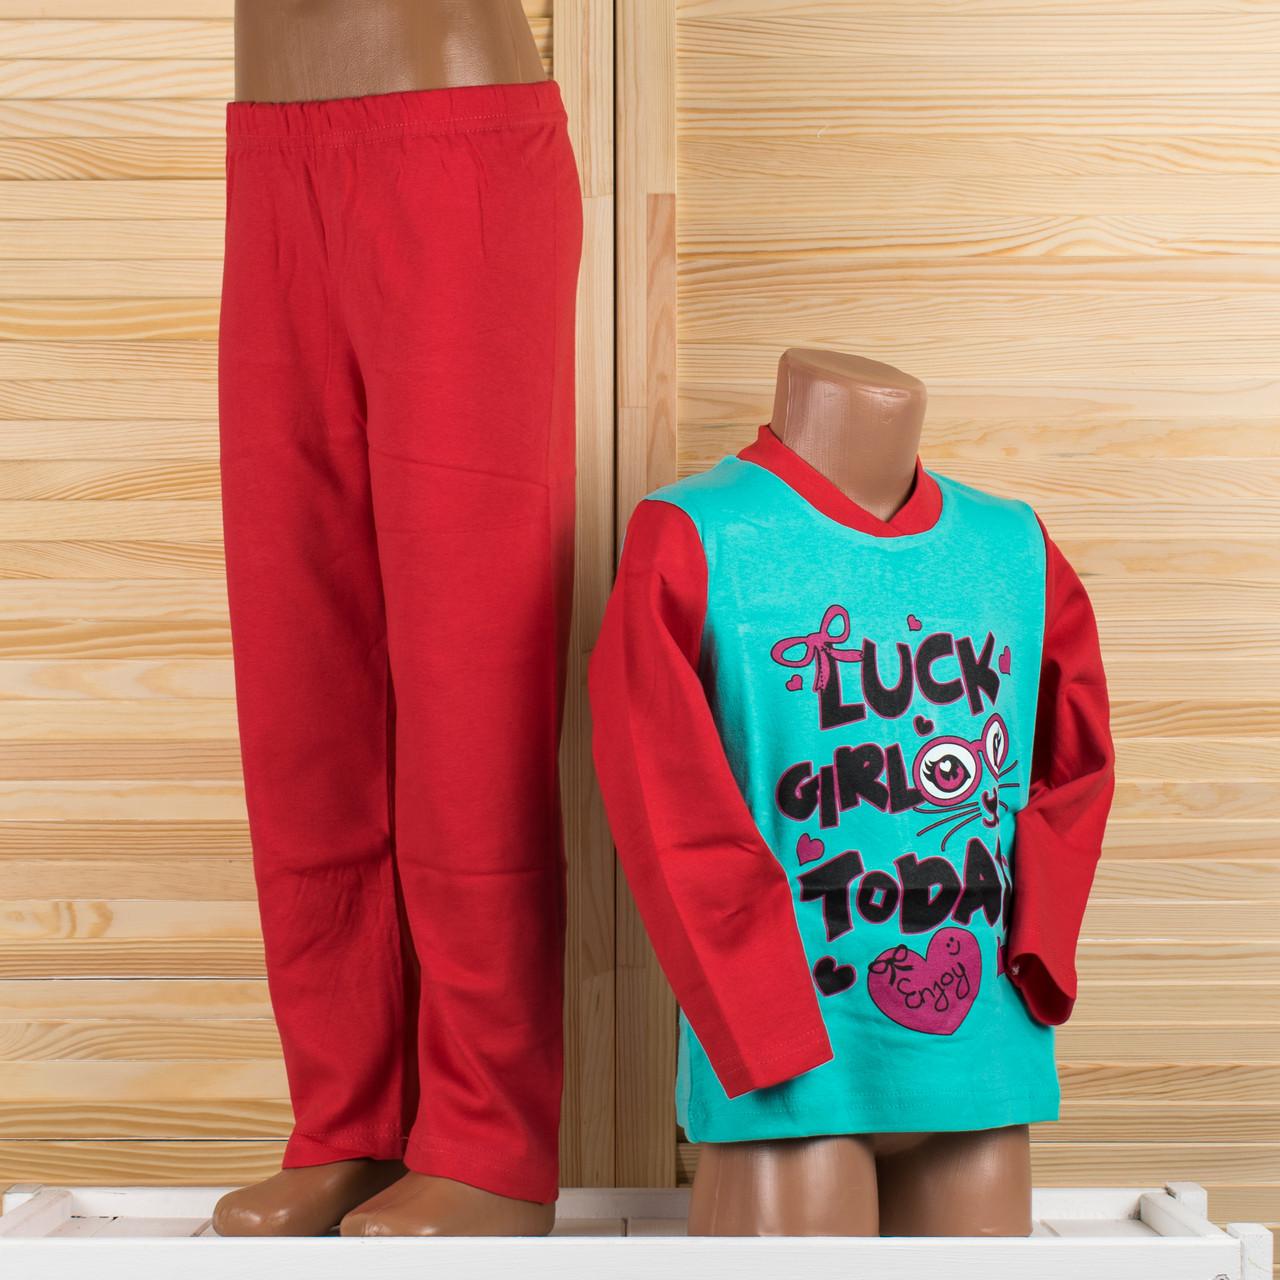 Детская пижама на девочку Турция. Moral 04-8 6/7. Размер на 6/7 лет.